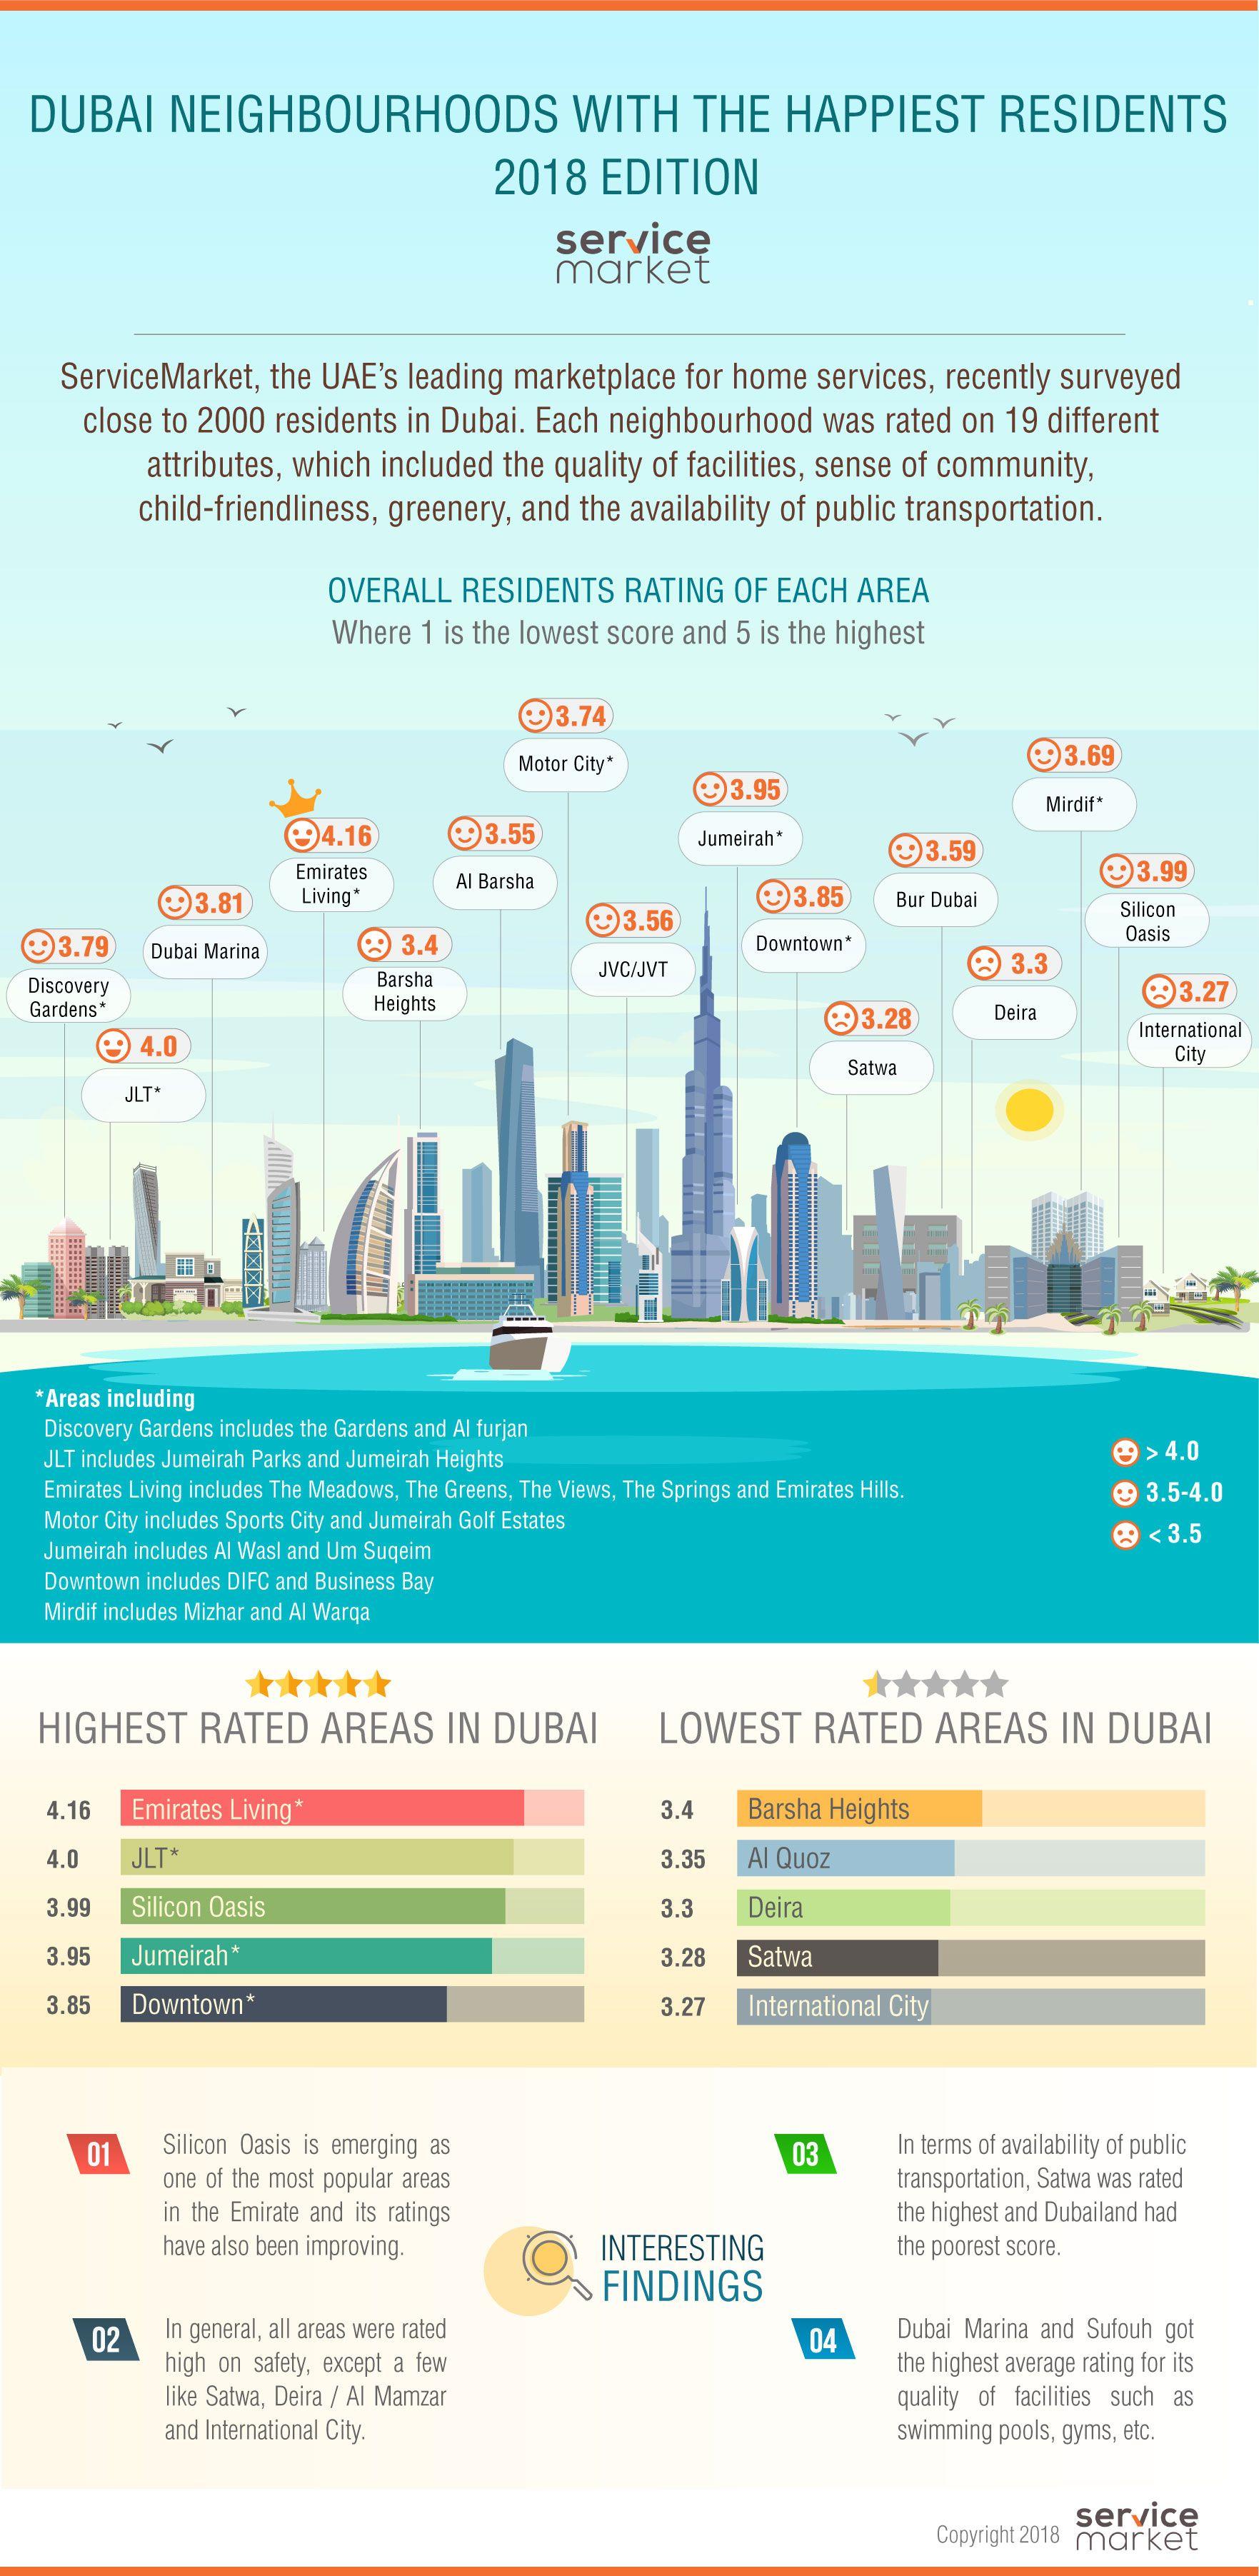 Dubai Neighbourhoods with the Happiest Residents